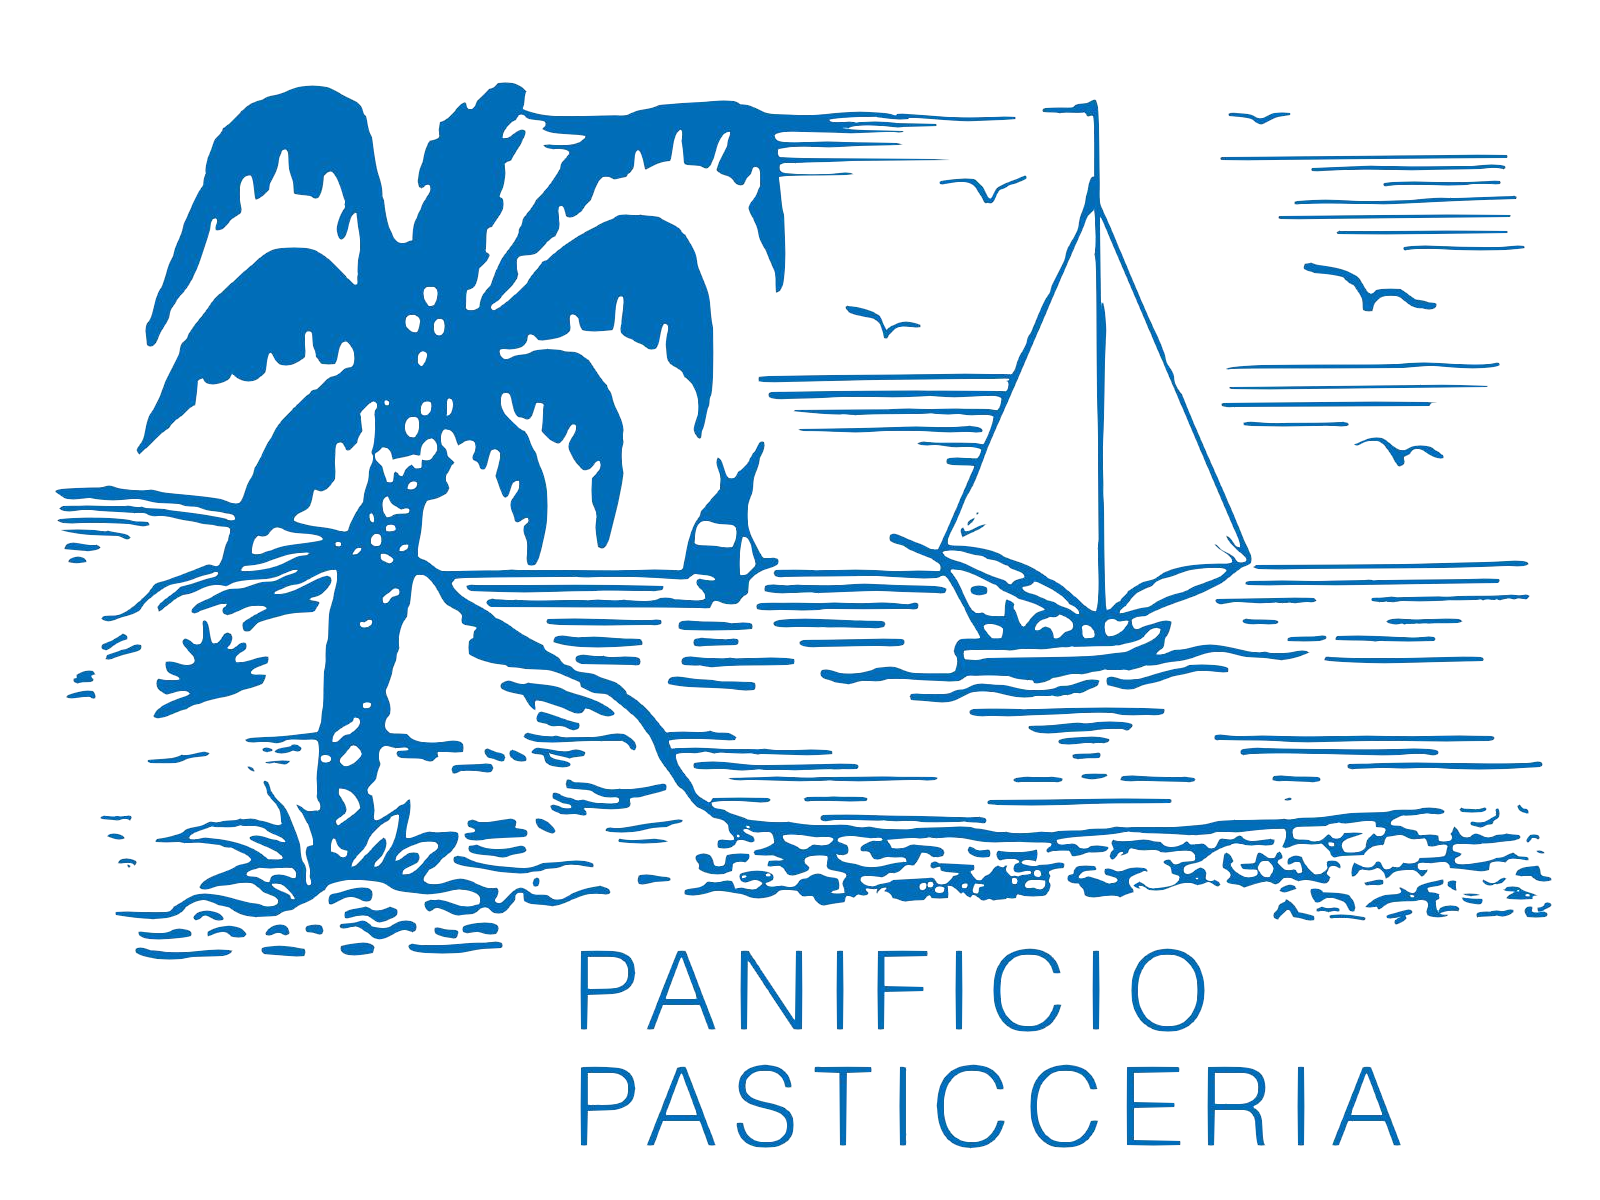 https://www.panificiopasticceriacentrale.com/wp-content/uploads/2018/08/prova.png